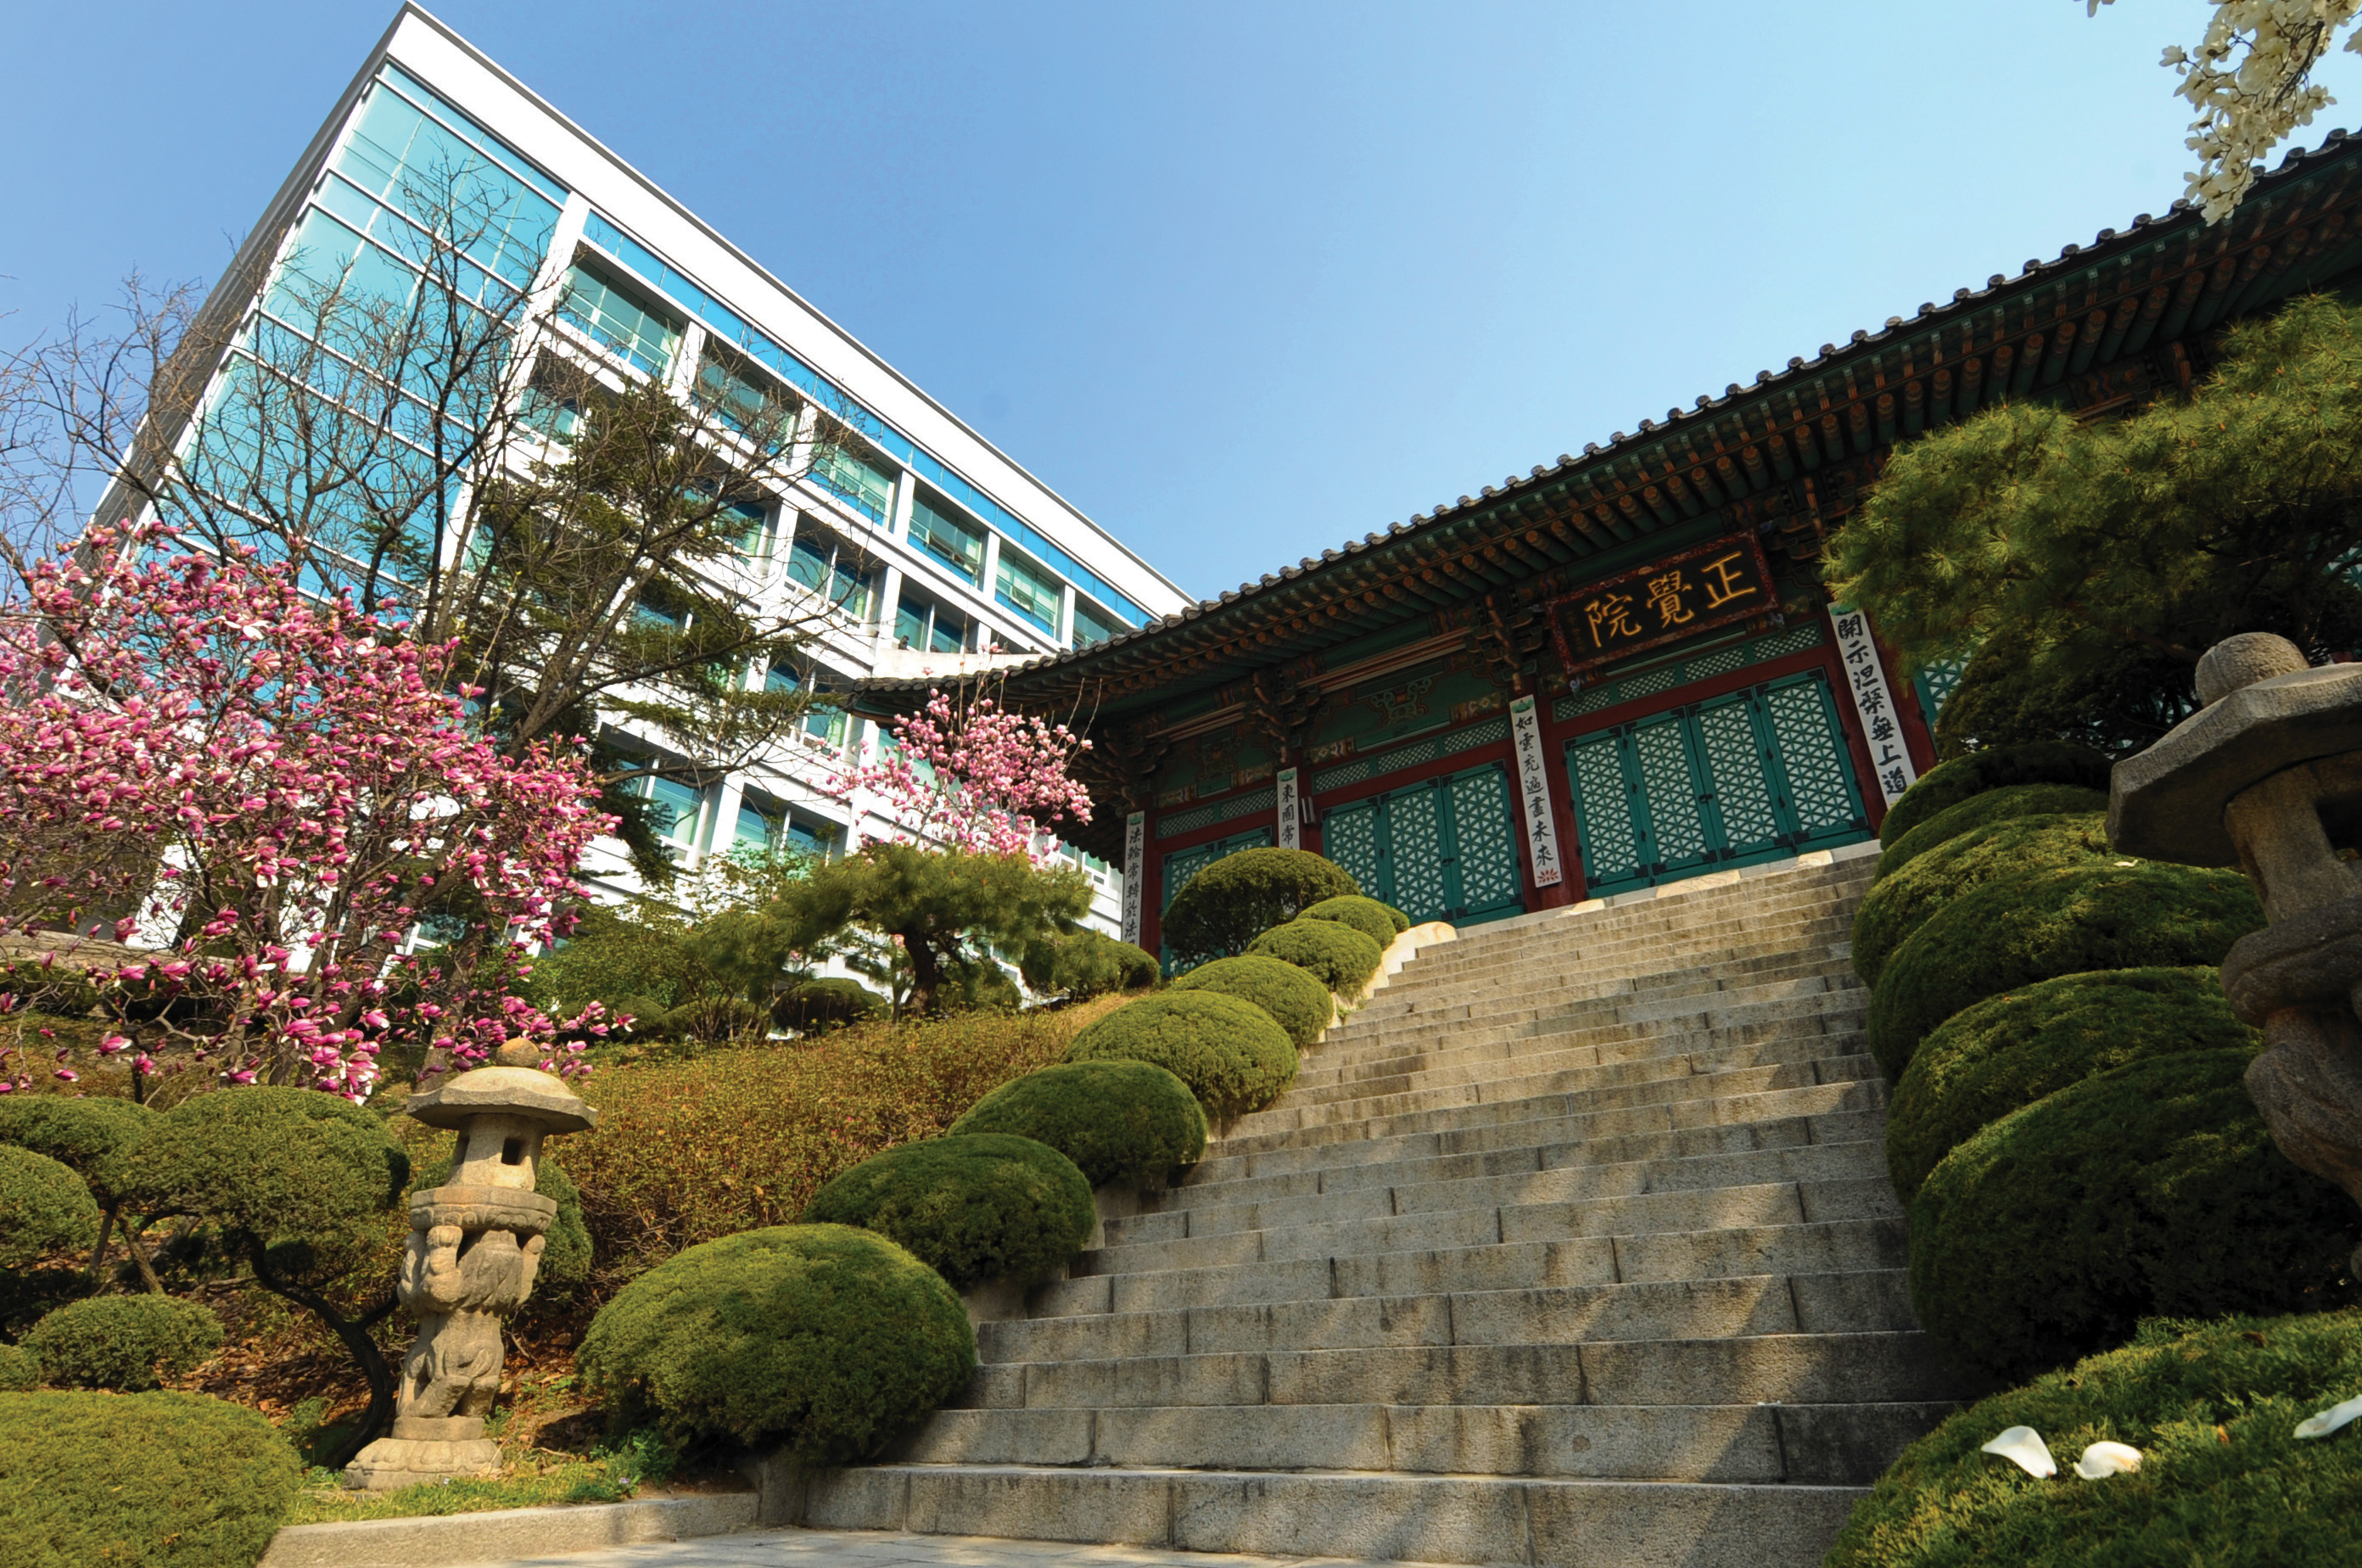 DONGGUK_UNIVERSITY_Jeonggakwon(korean_buddhist)